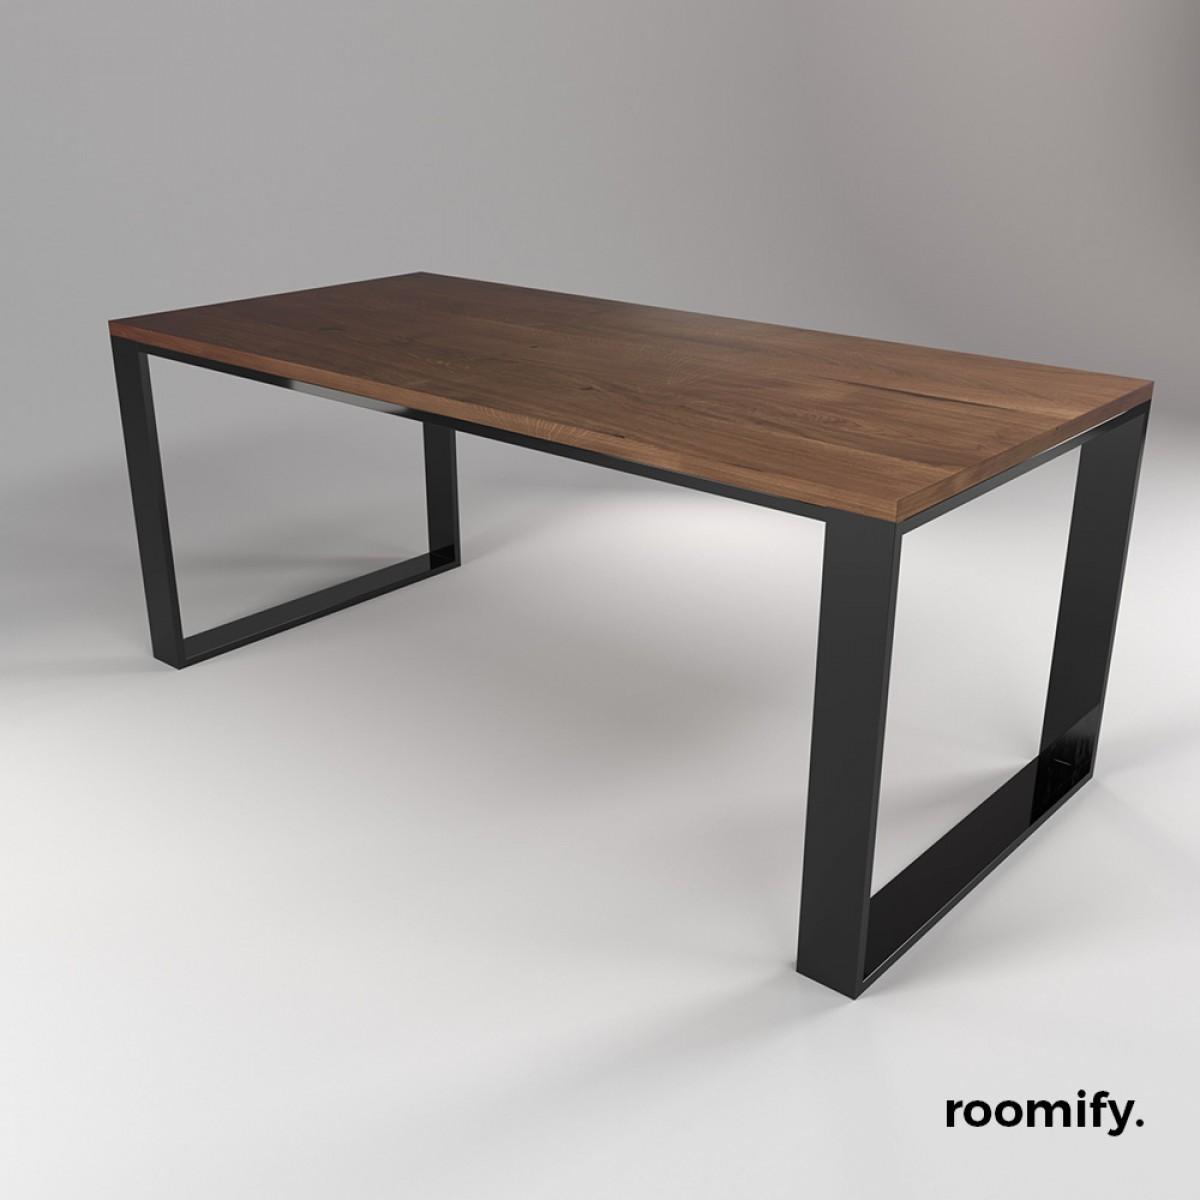 roomify Esstisch DAMIANO